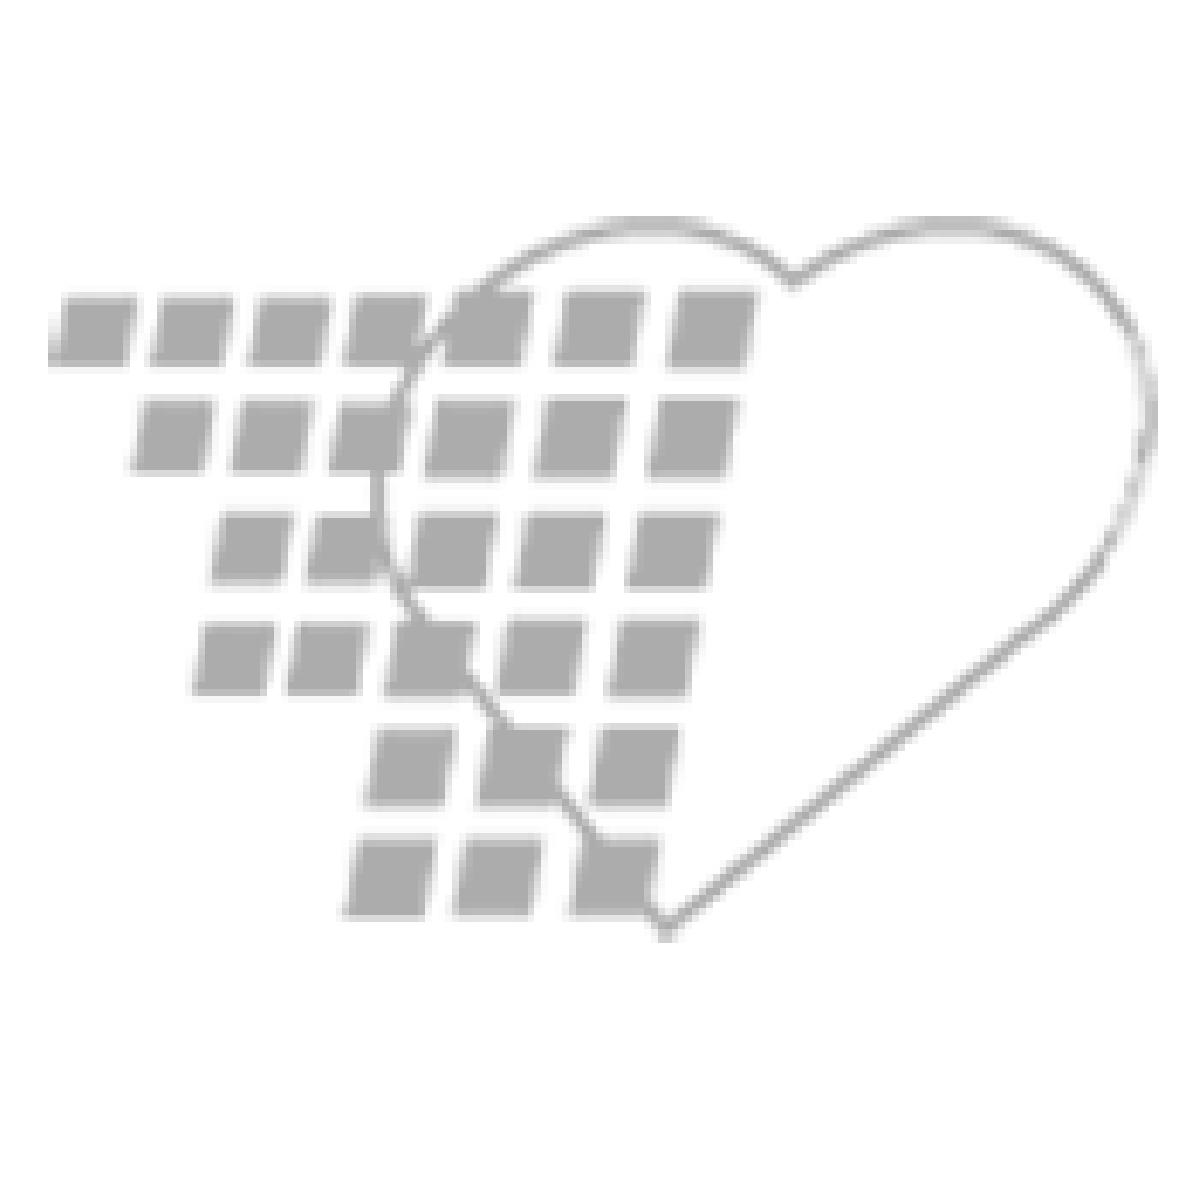 06-54-7520P Thermodilution 5 Lumen Catheter